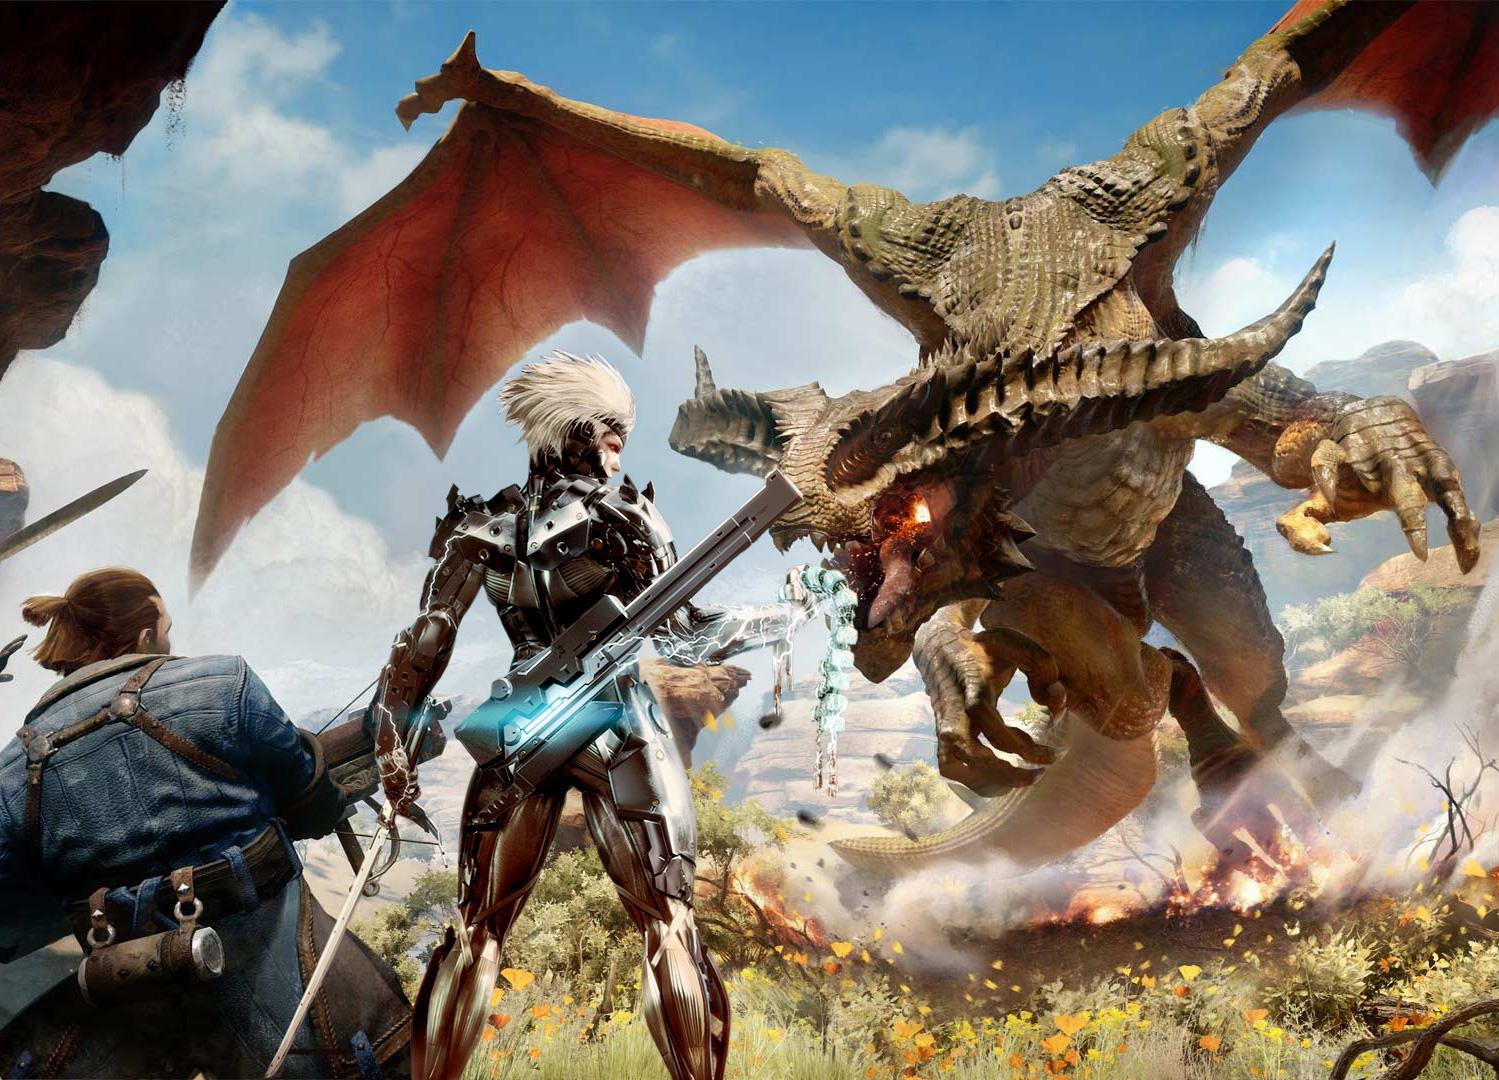 20 – Dragon Age Inquisition / Metal Gear Rising Revengeance